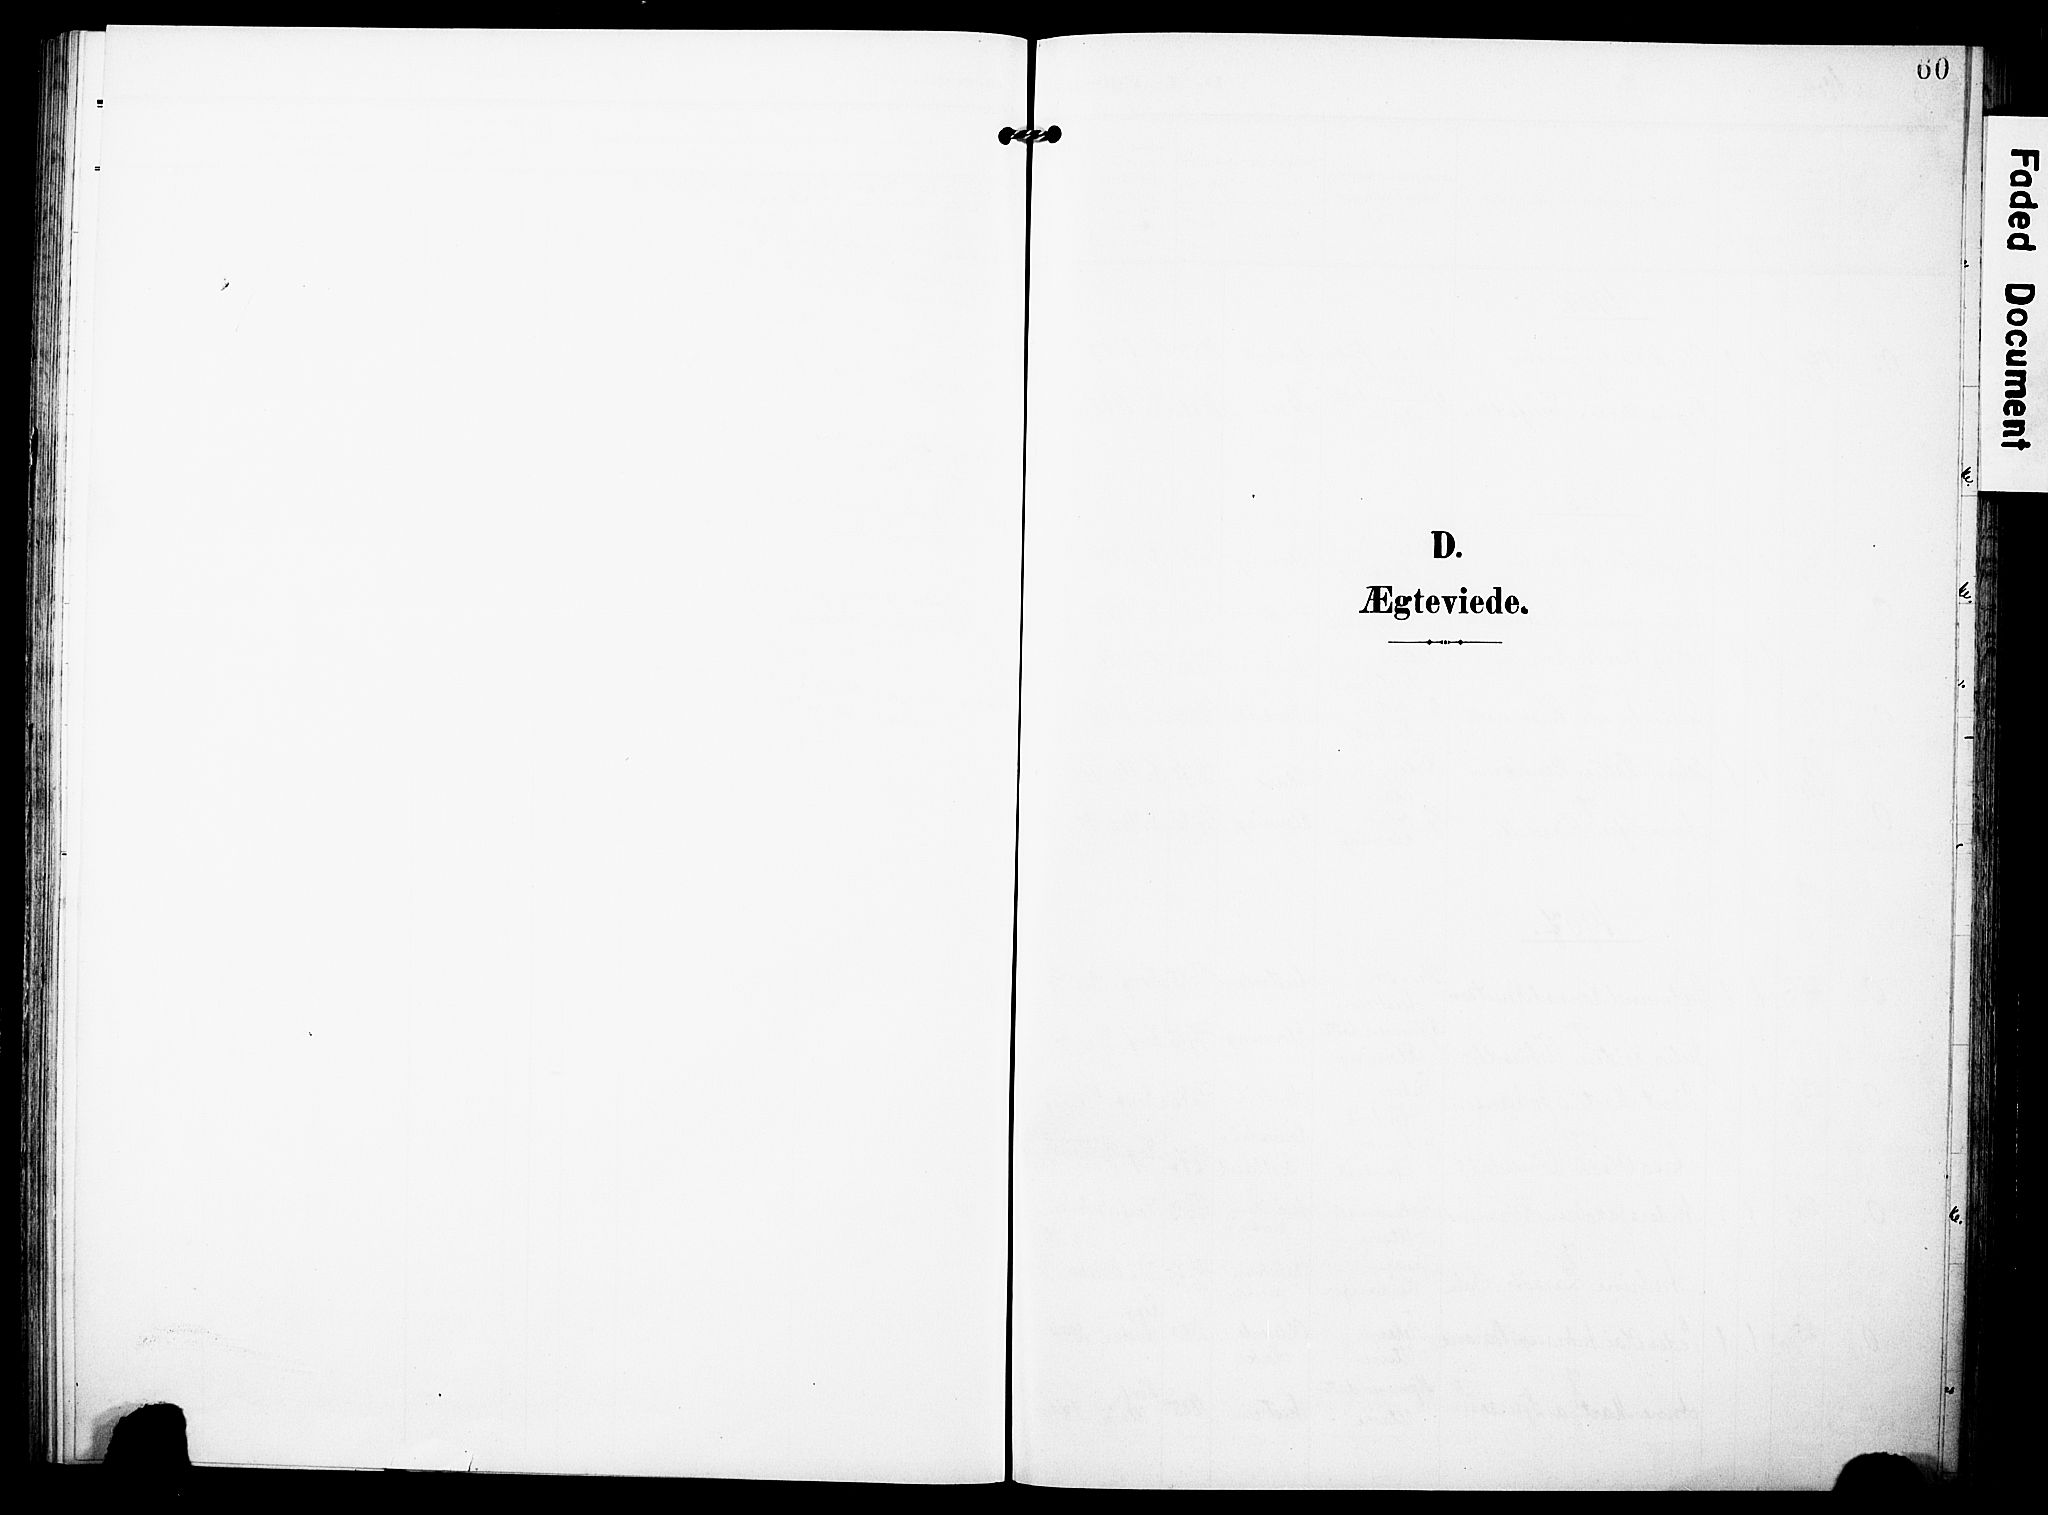 SAST, Torvastad sokneprestkontor, H/Ha/Haa/L0018: Ministerialbok nr. A 17, 1903-1925, s. 60